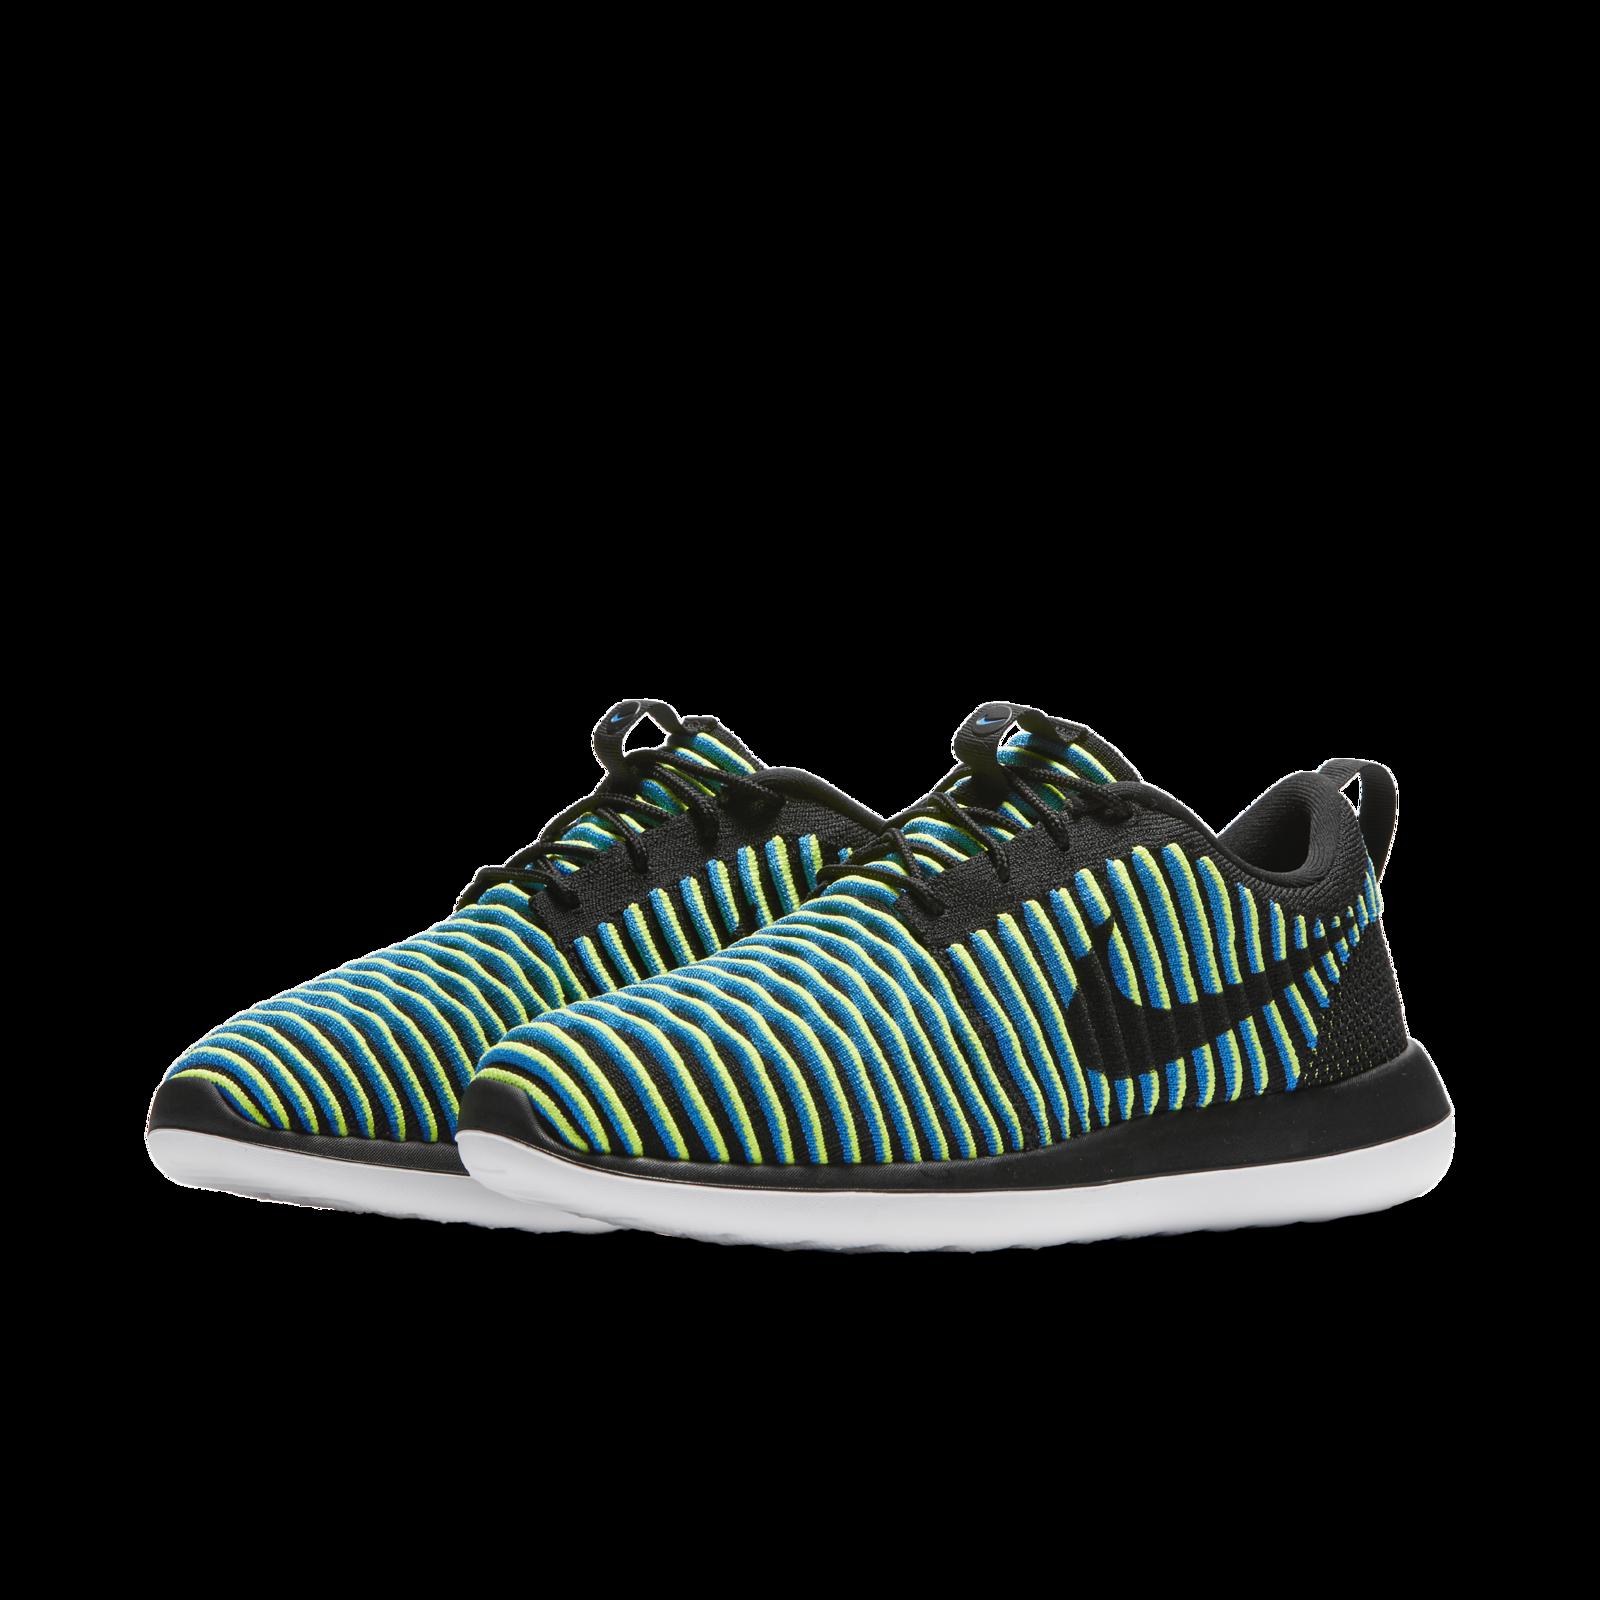 Strada principale corto Iniziativa  Nike Roshe Two Officially Unveiled   Nice Kicks